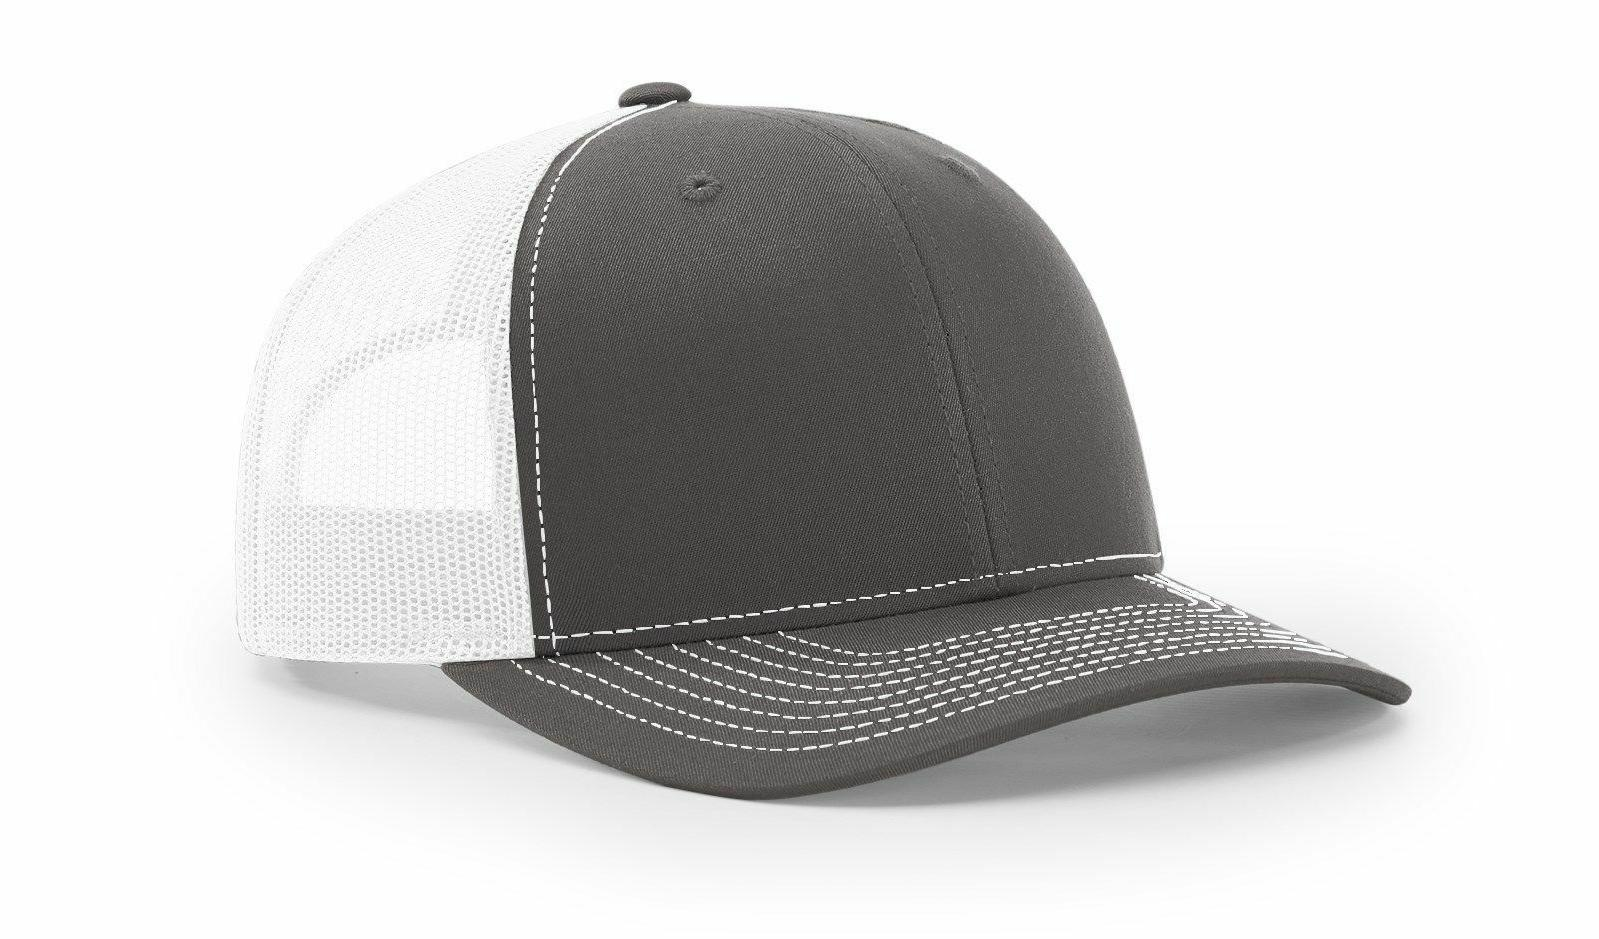 CHARCOAL WHITE 112 Richardson Trucker Ball Cap Mesh Hat Adju